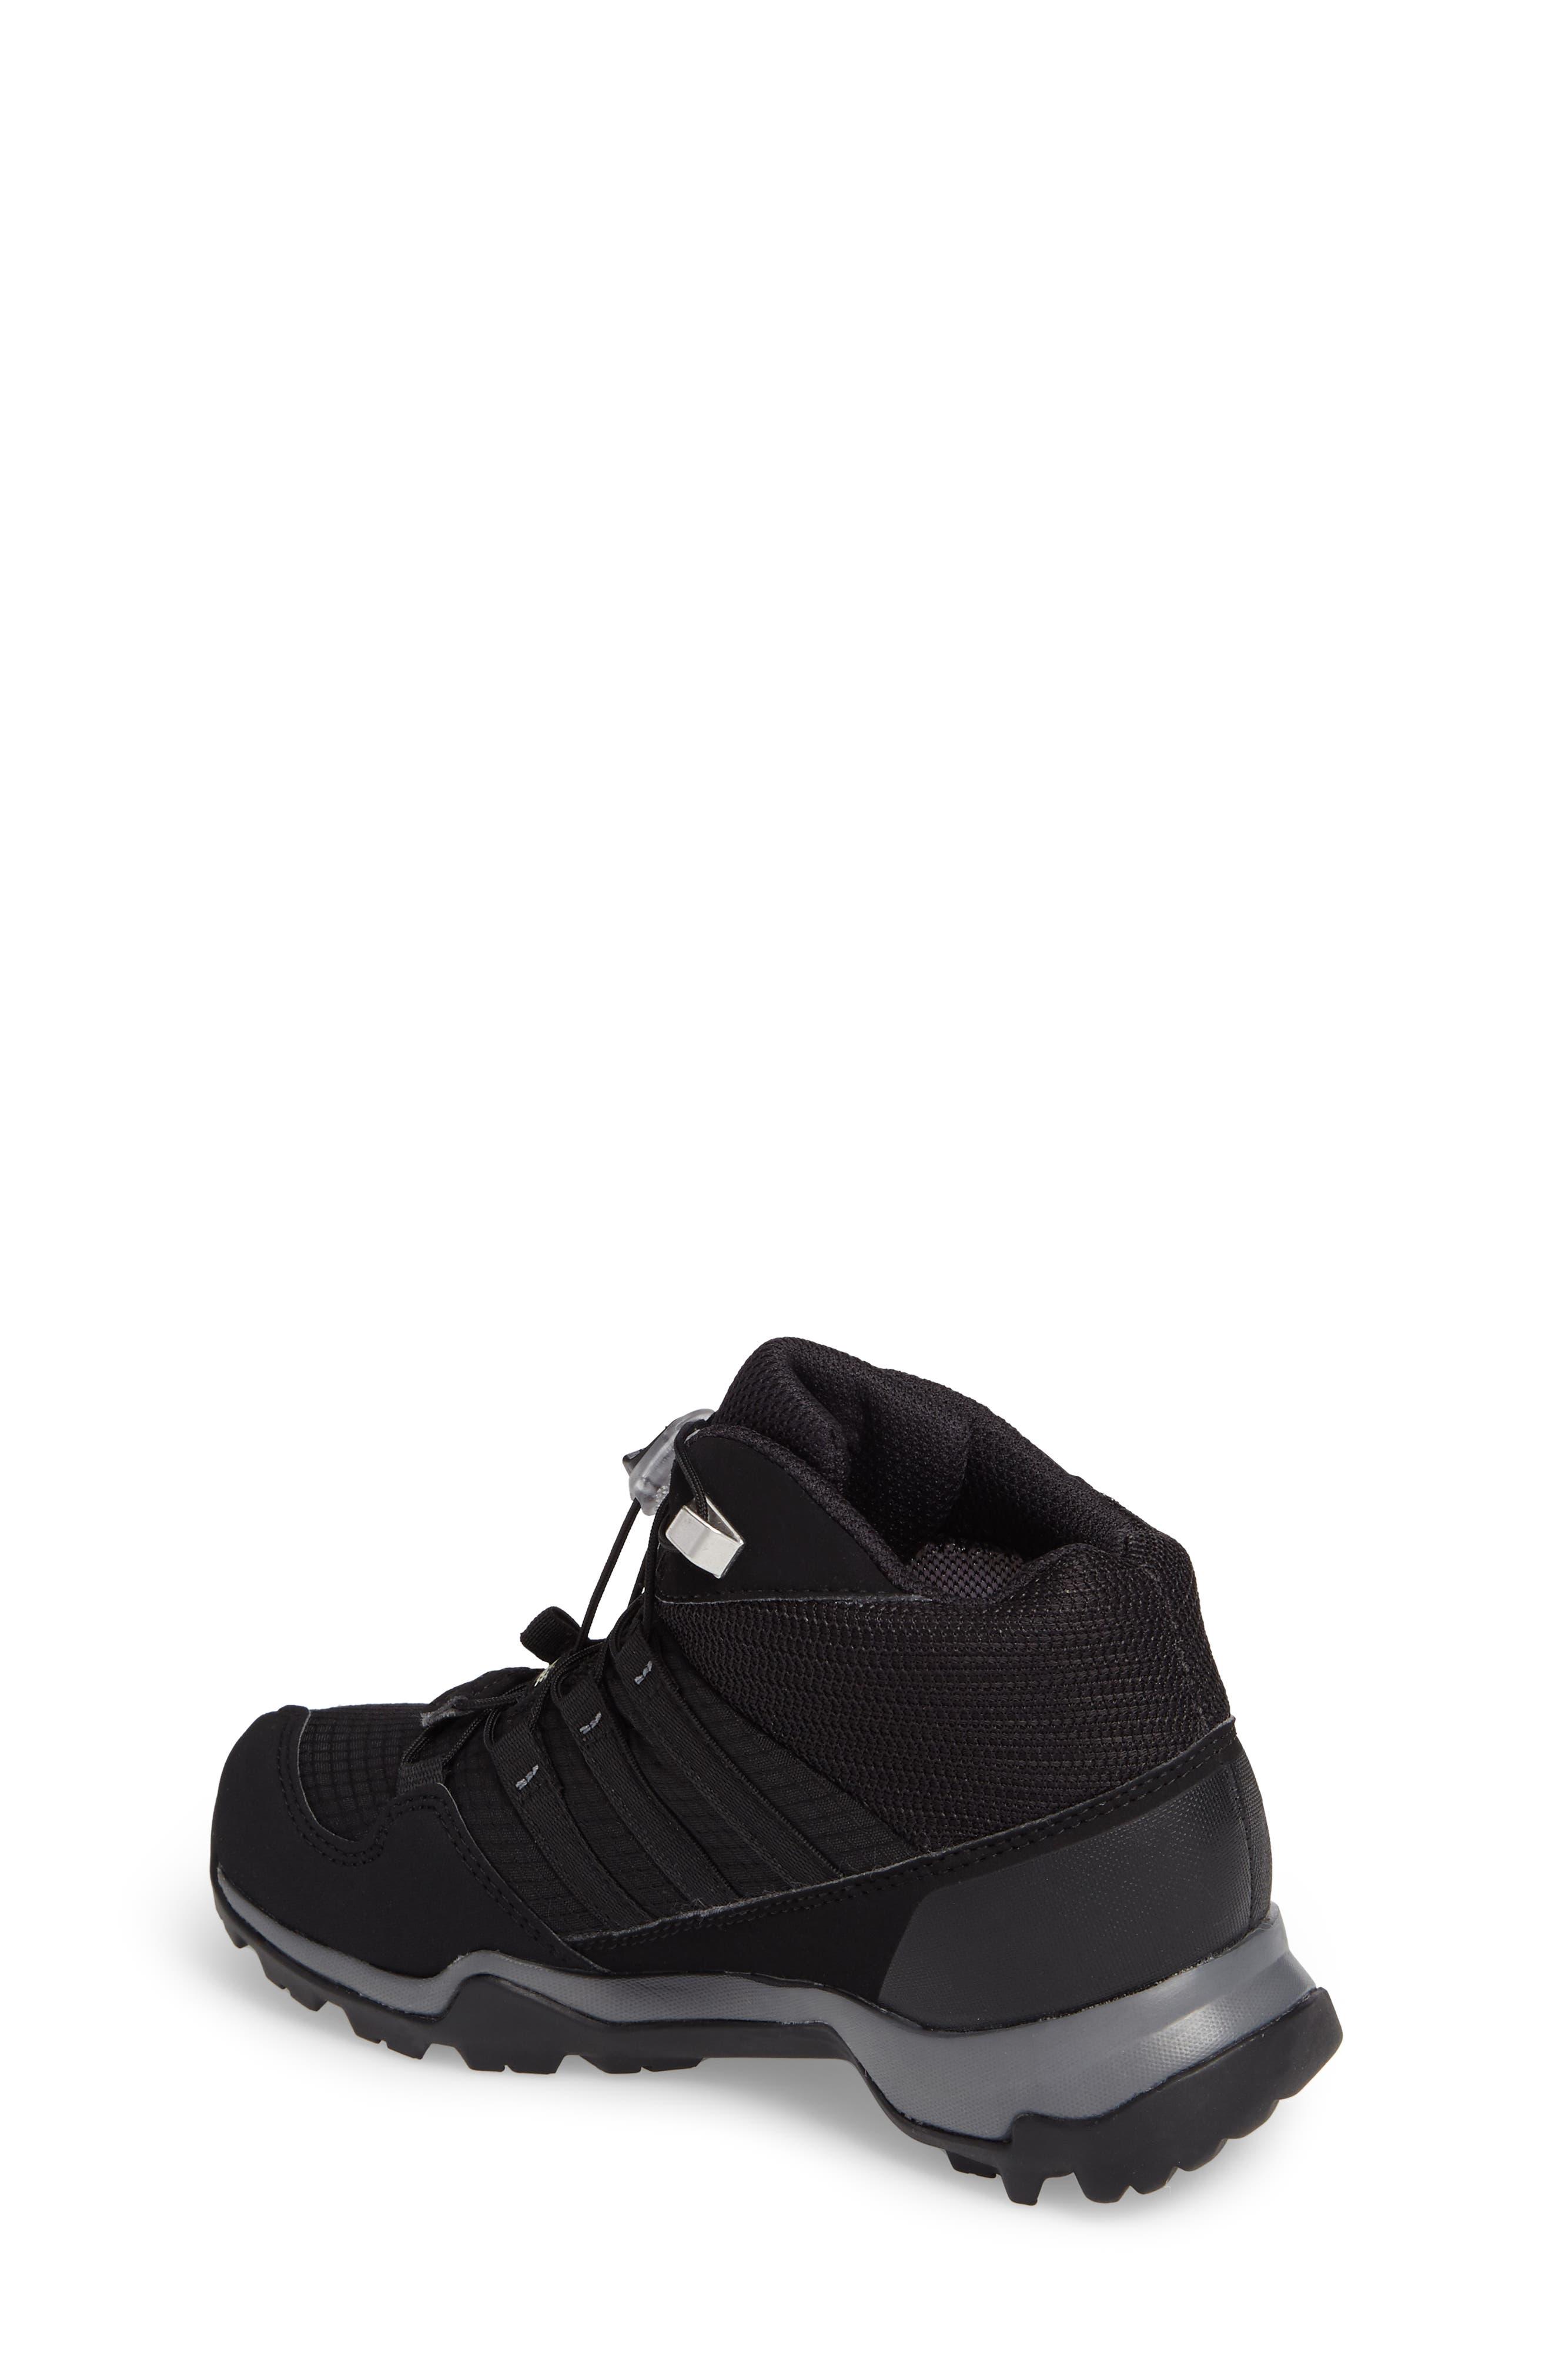 Terrex Mid Gore-Tex<sup>®</sup> Insulated Waterproof Sneaker Boot,                             Alternate thumbnail 2, color,                             Black/ Black/ Vista Grey